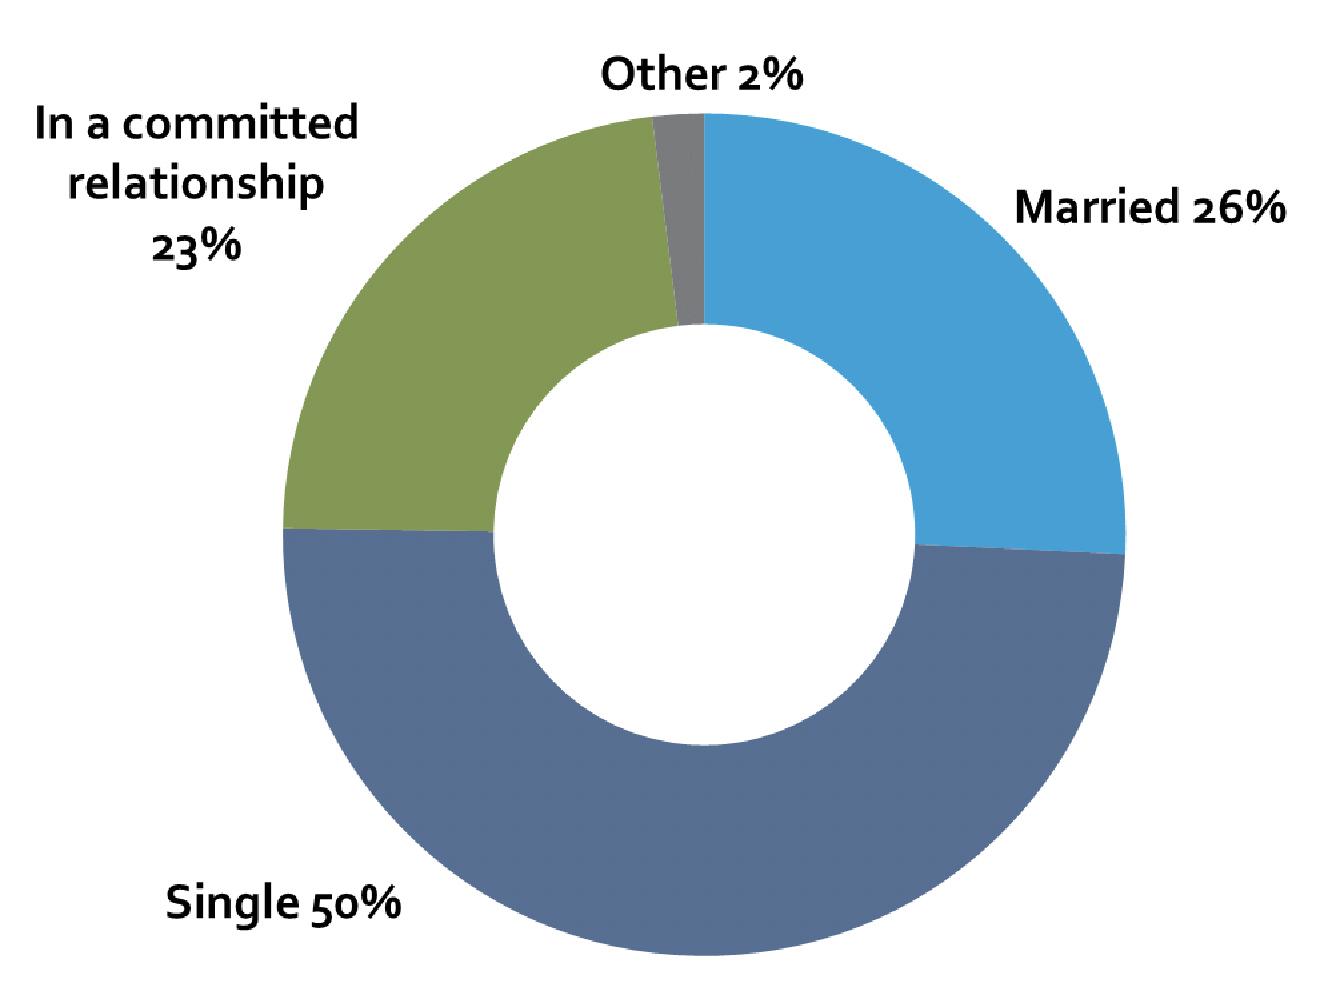 MILLENNIAL MARITAL STATUS